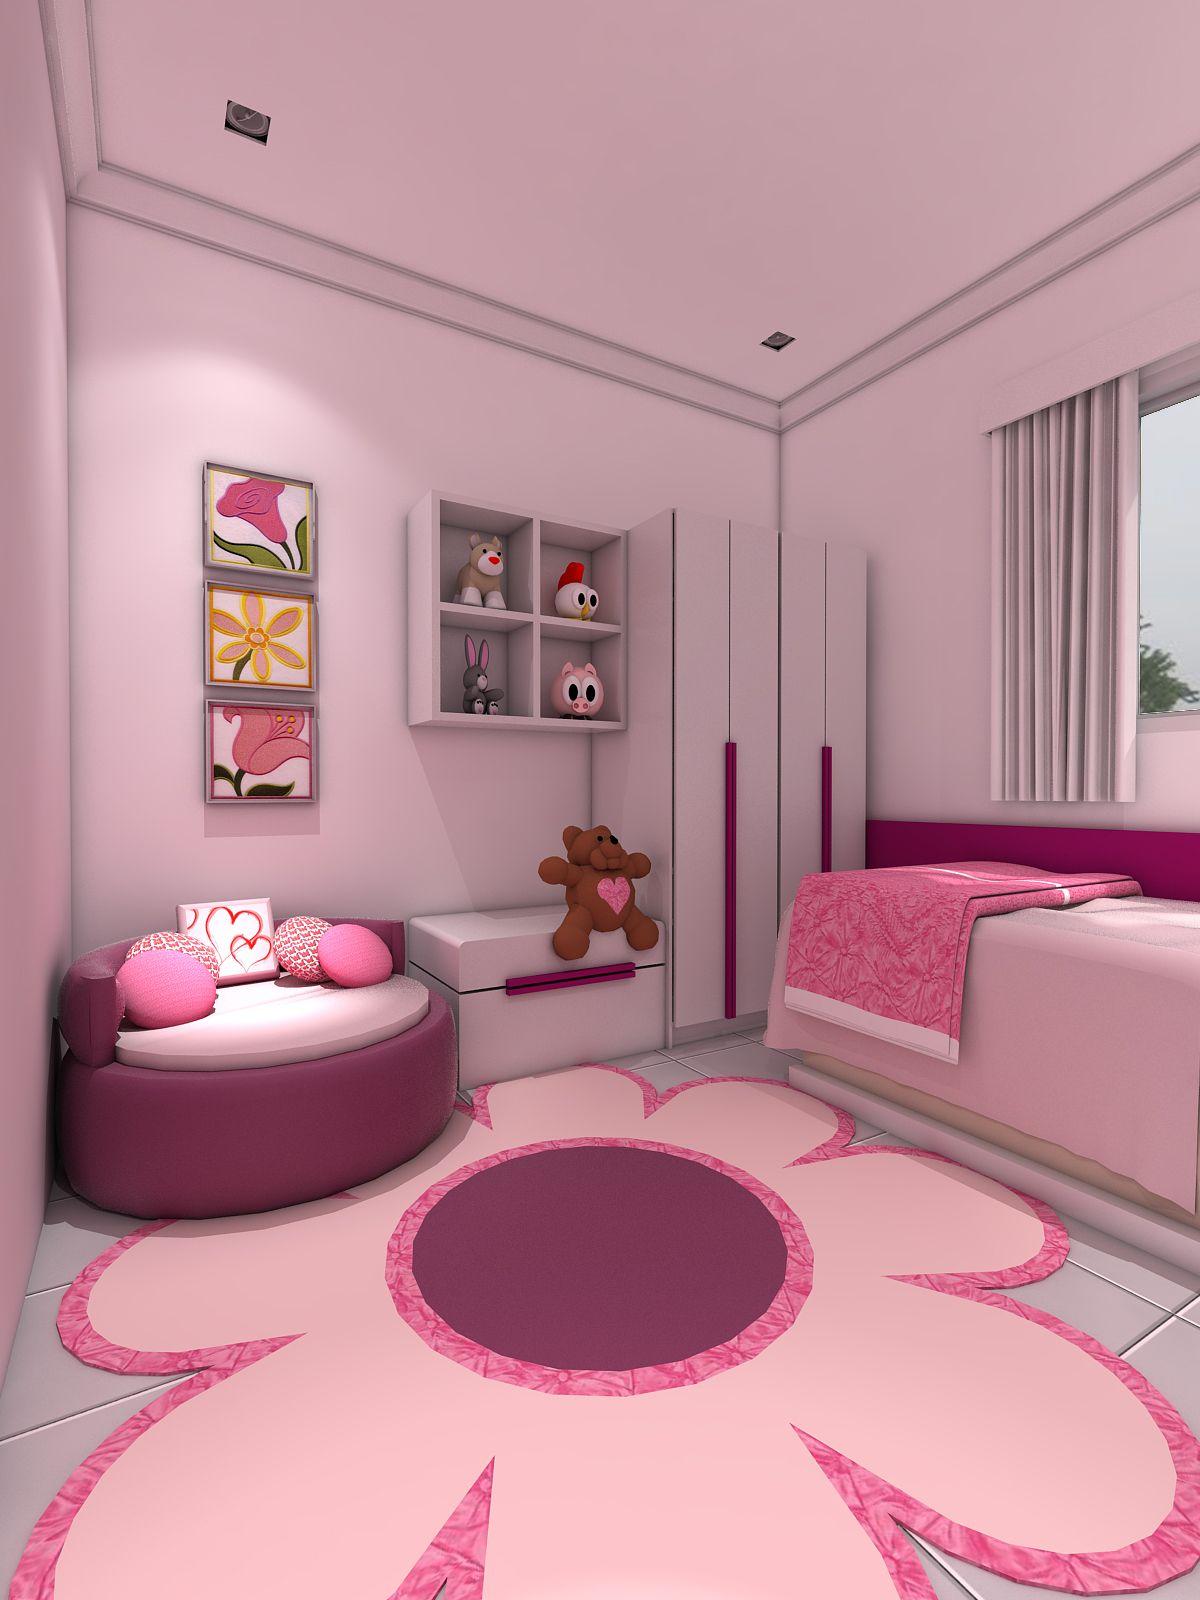 Pin Di Princess Ideas For Little Girls